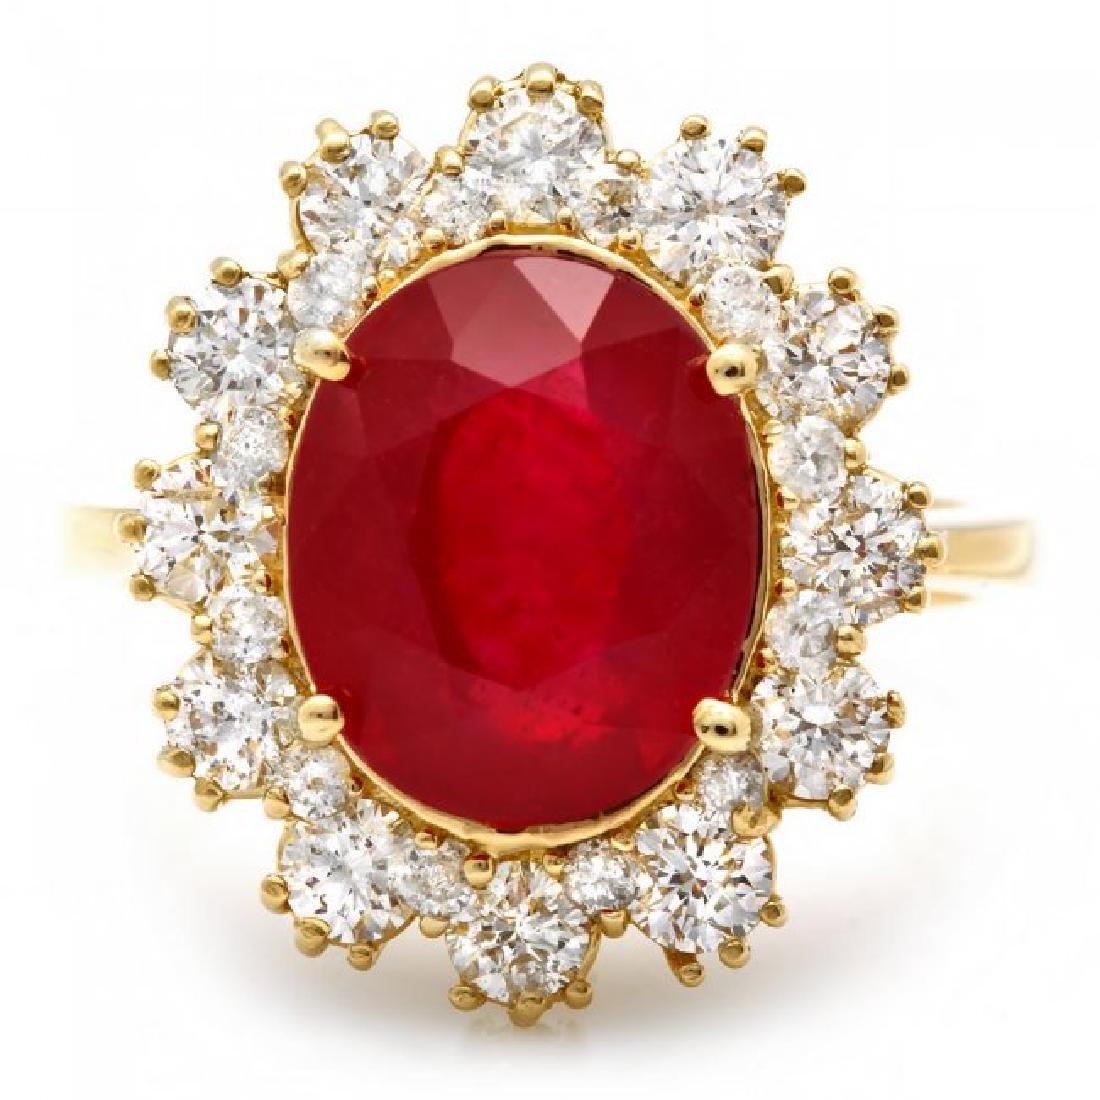 14k Yellow Gold 5.50ct Ruby 1.30ct Diamond Ring - 2